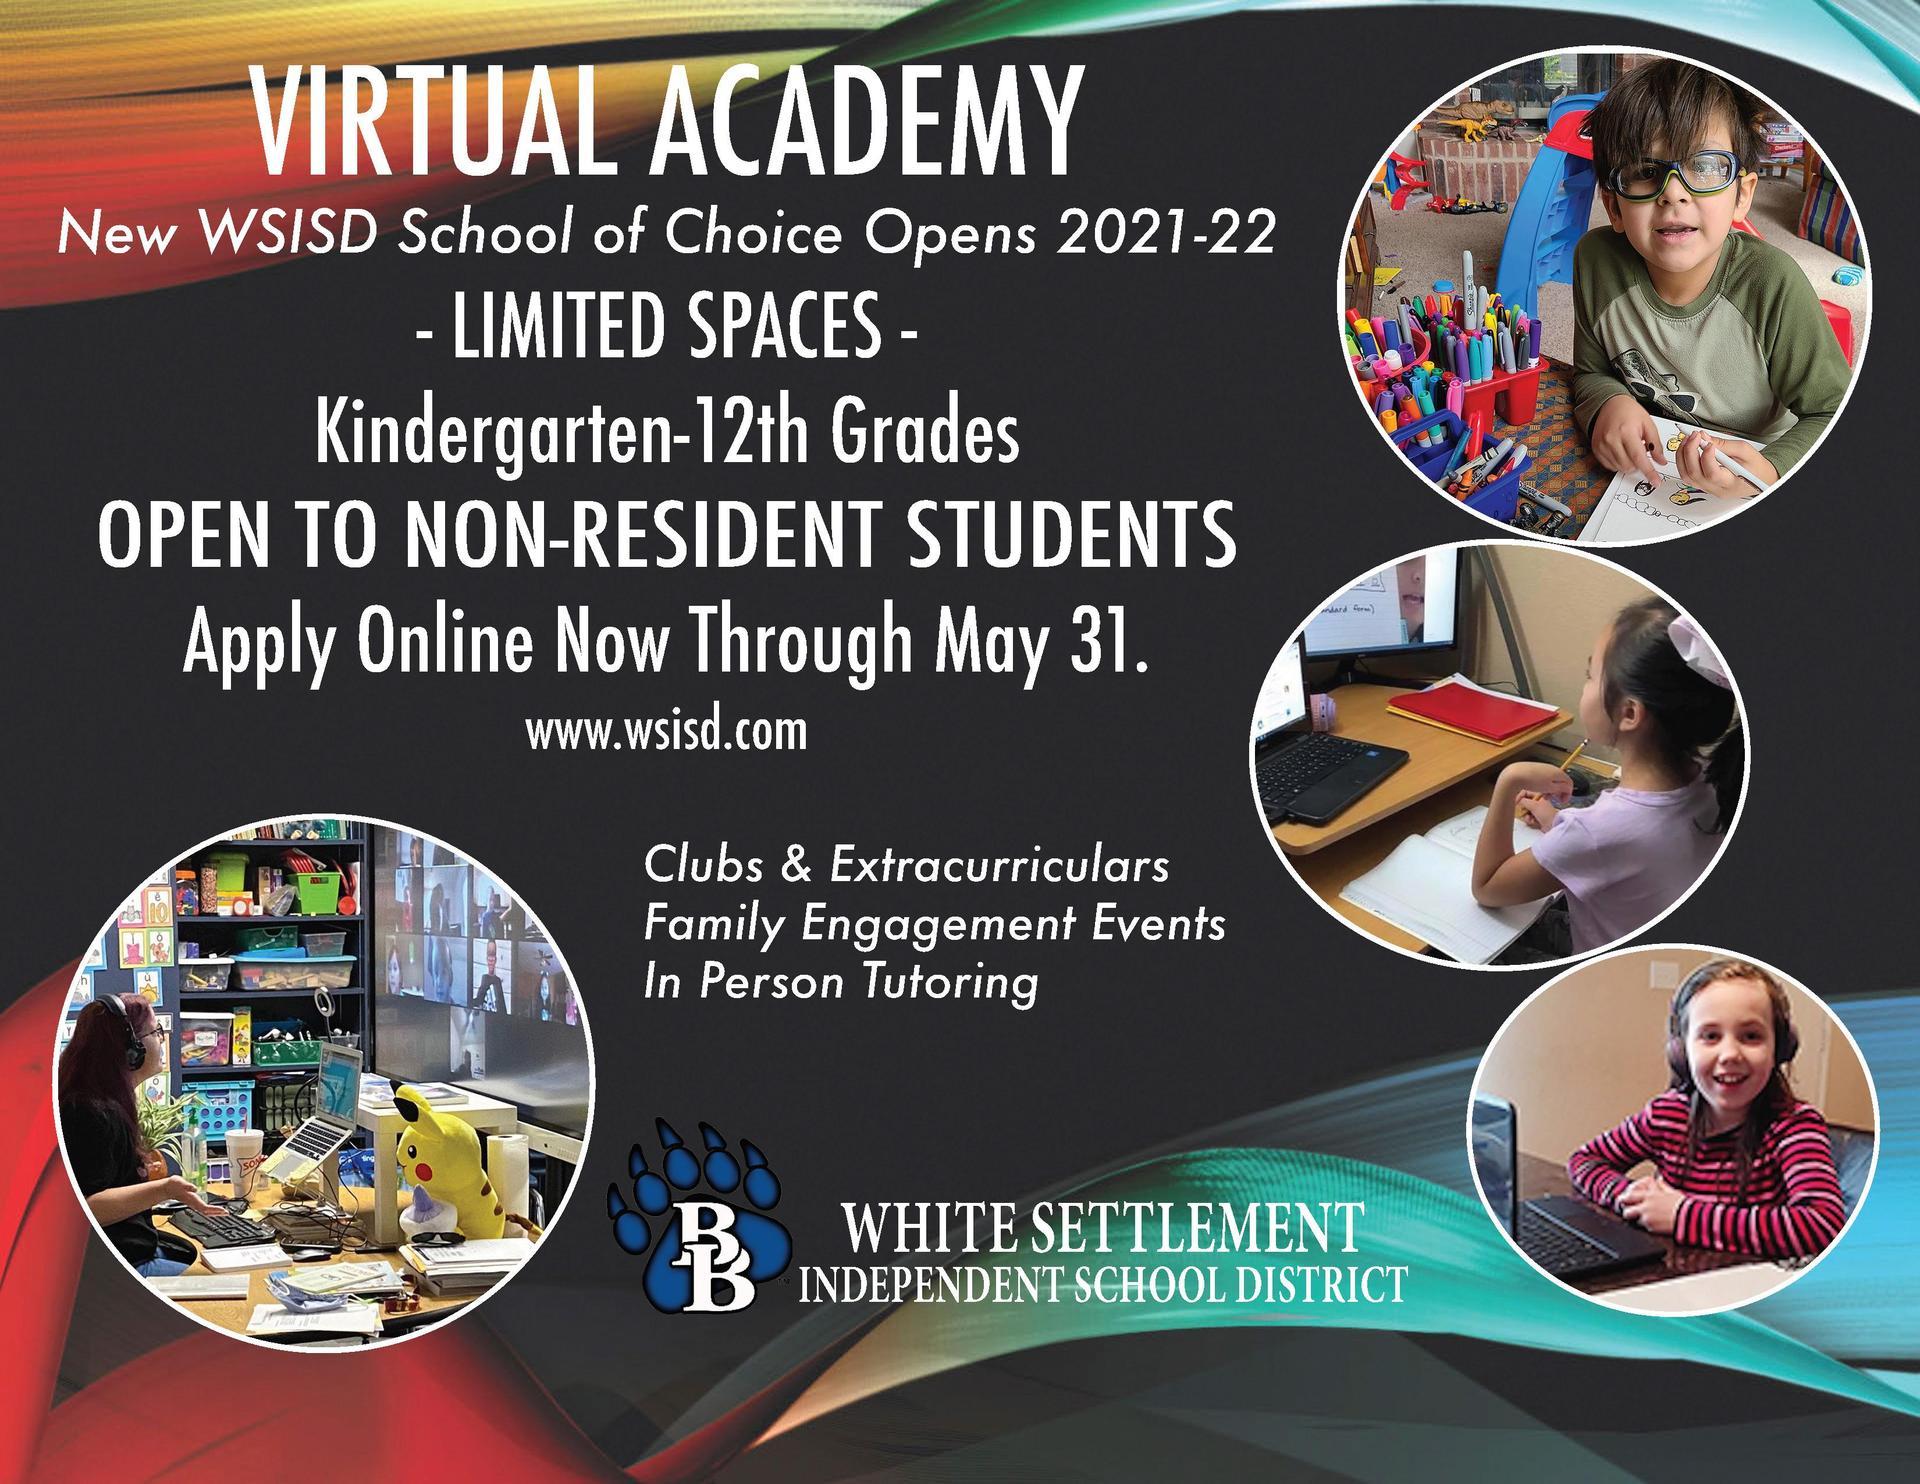 Virtual Academy Flyer